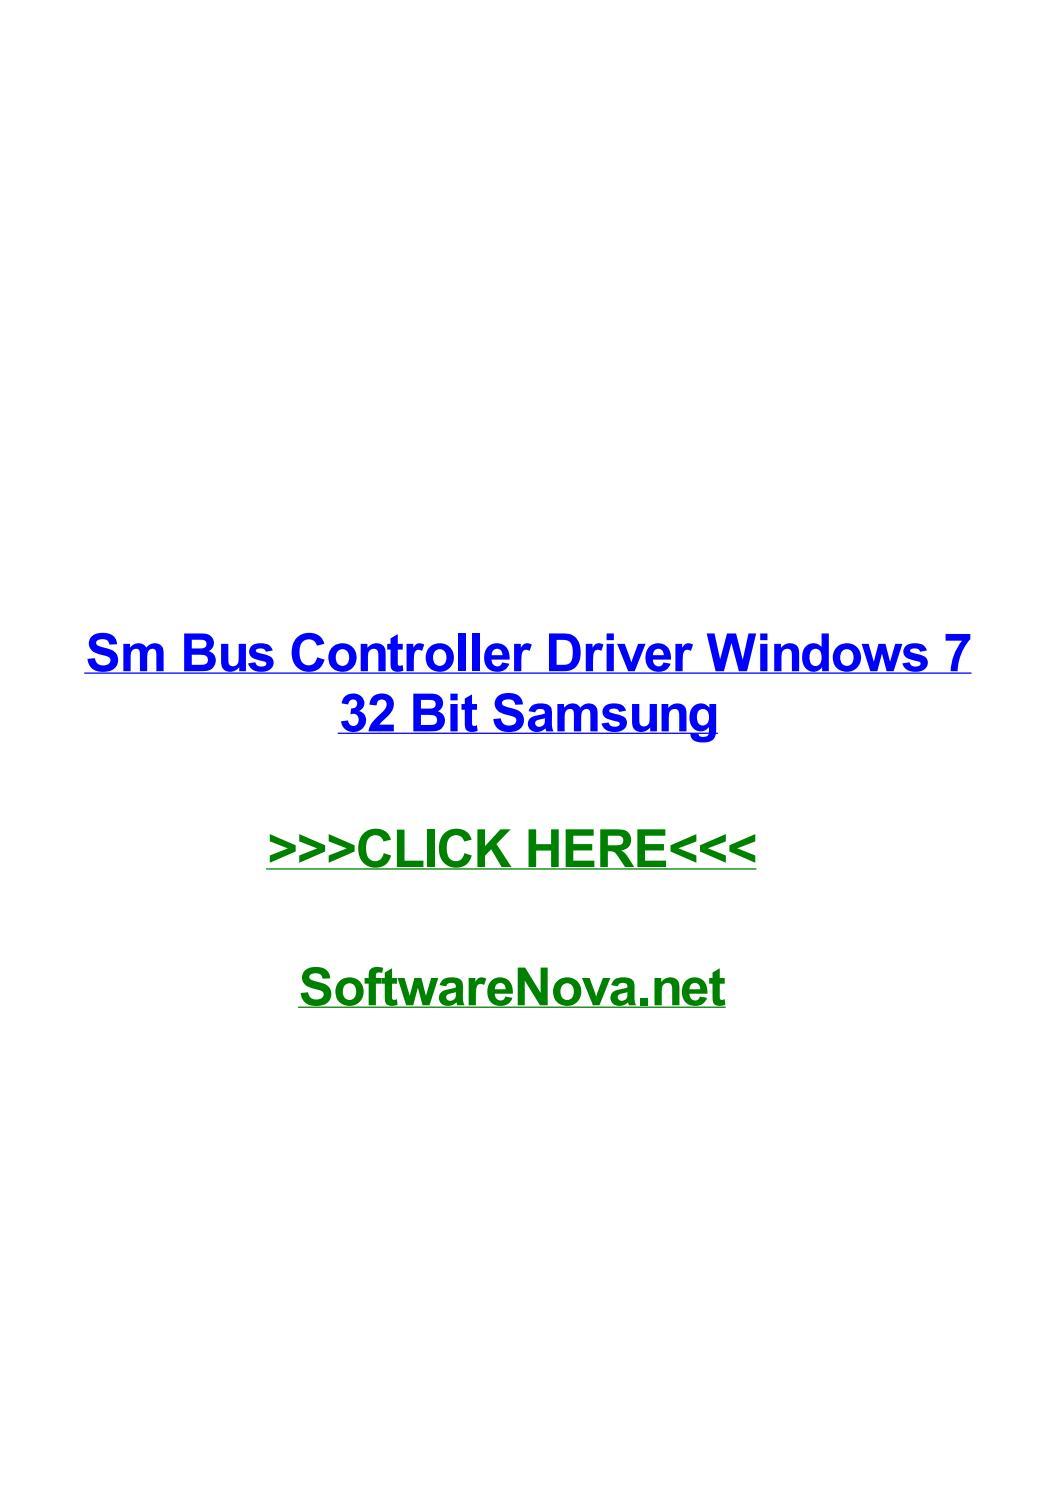 Sm bus controller driver windows 7 64 bit samsung.